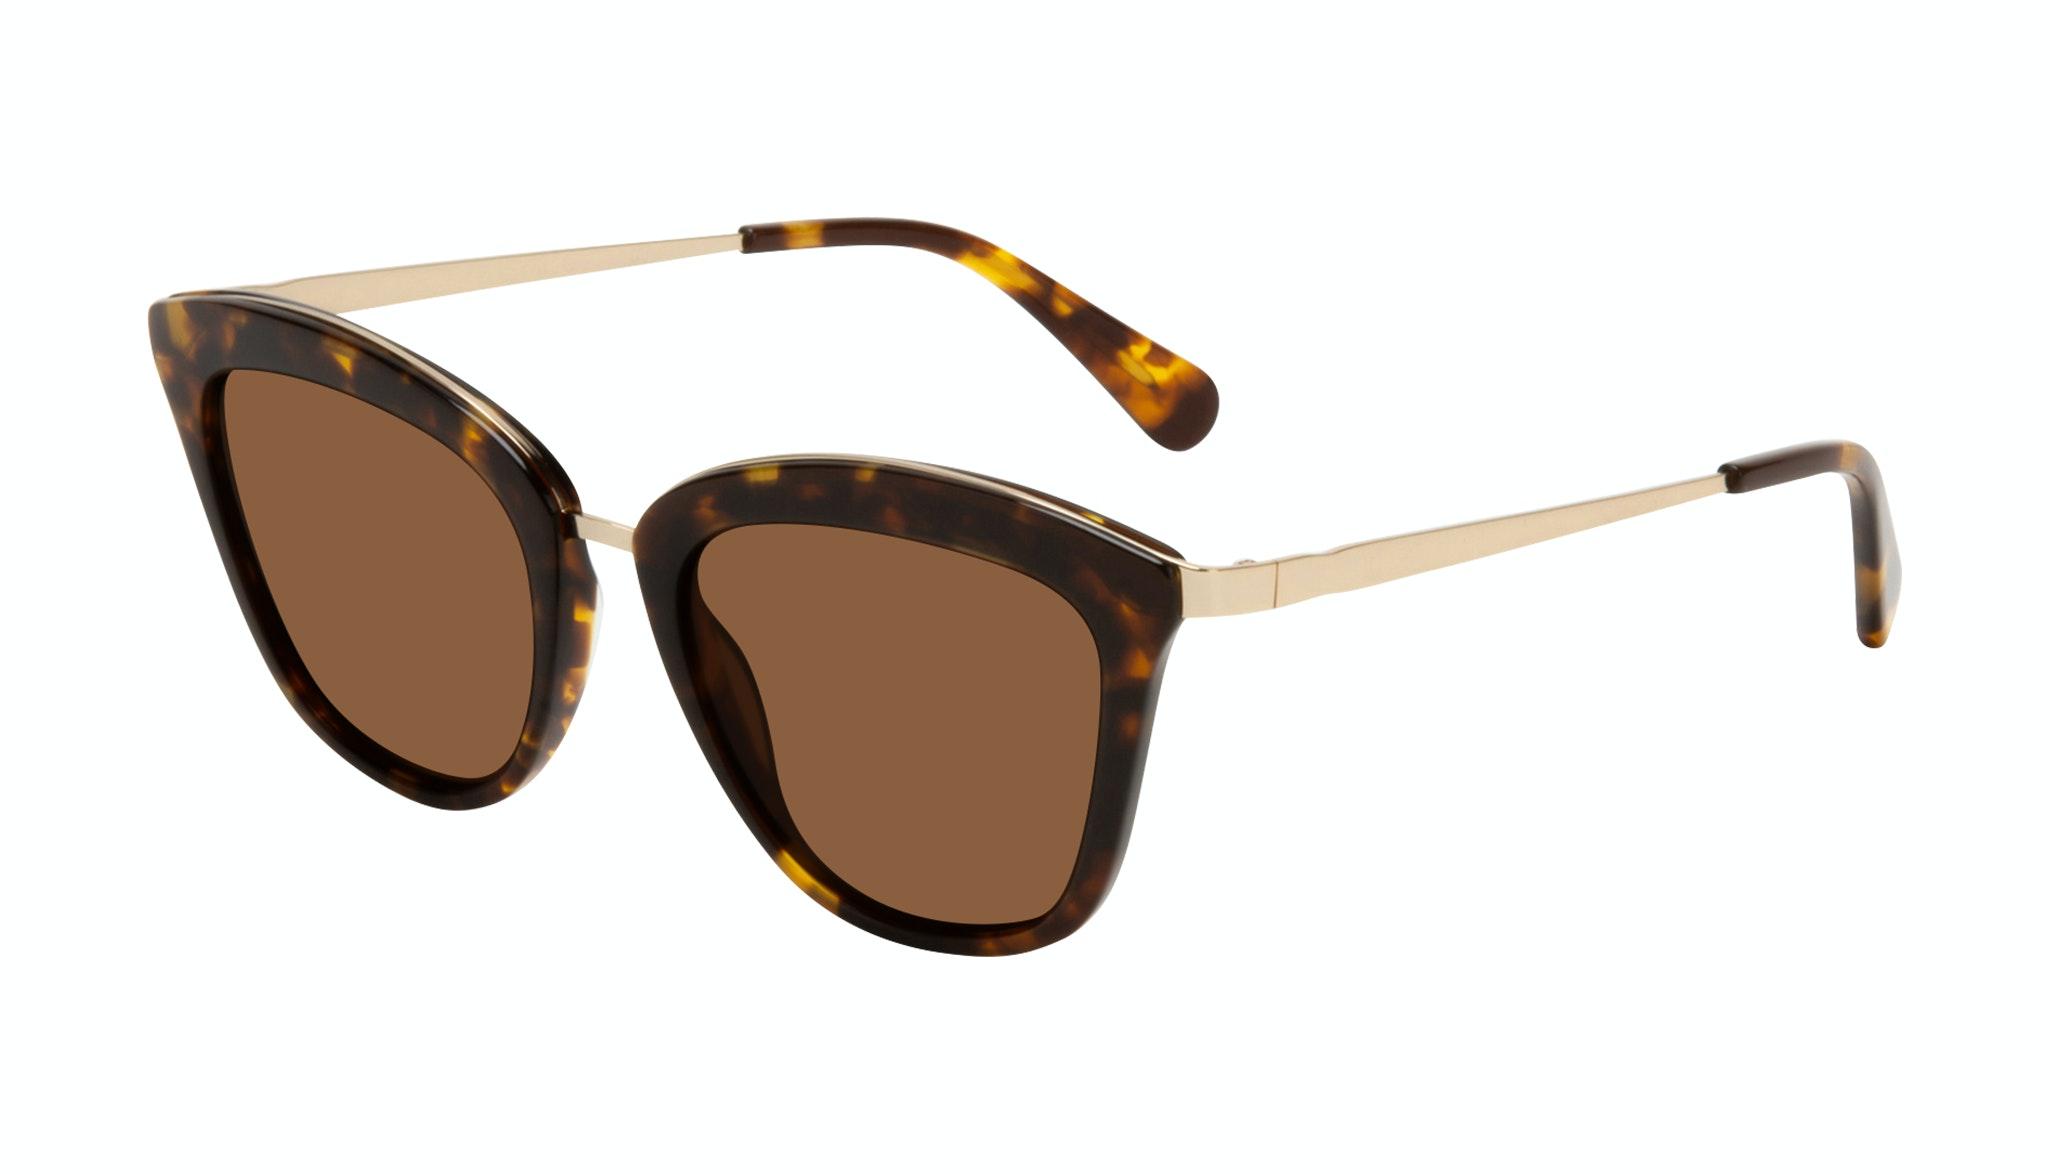 Affordable Fashion Glasses Rectangle Square Sunglasses Women More Tortoise Tilt